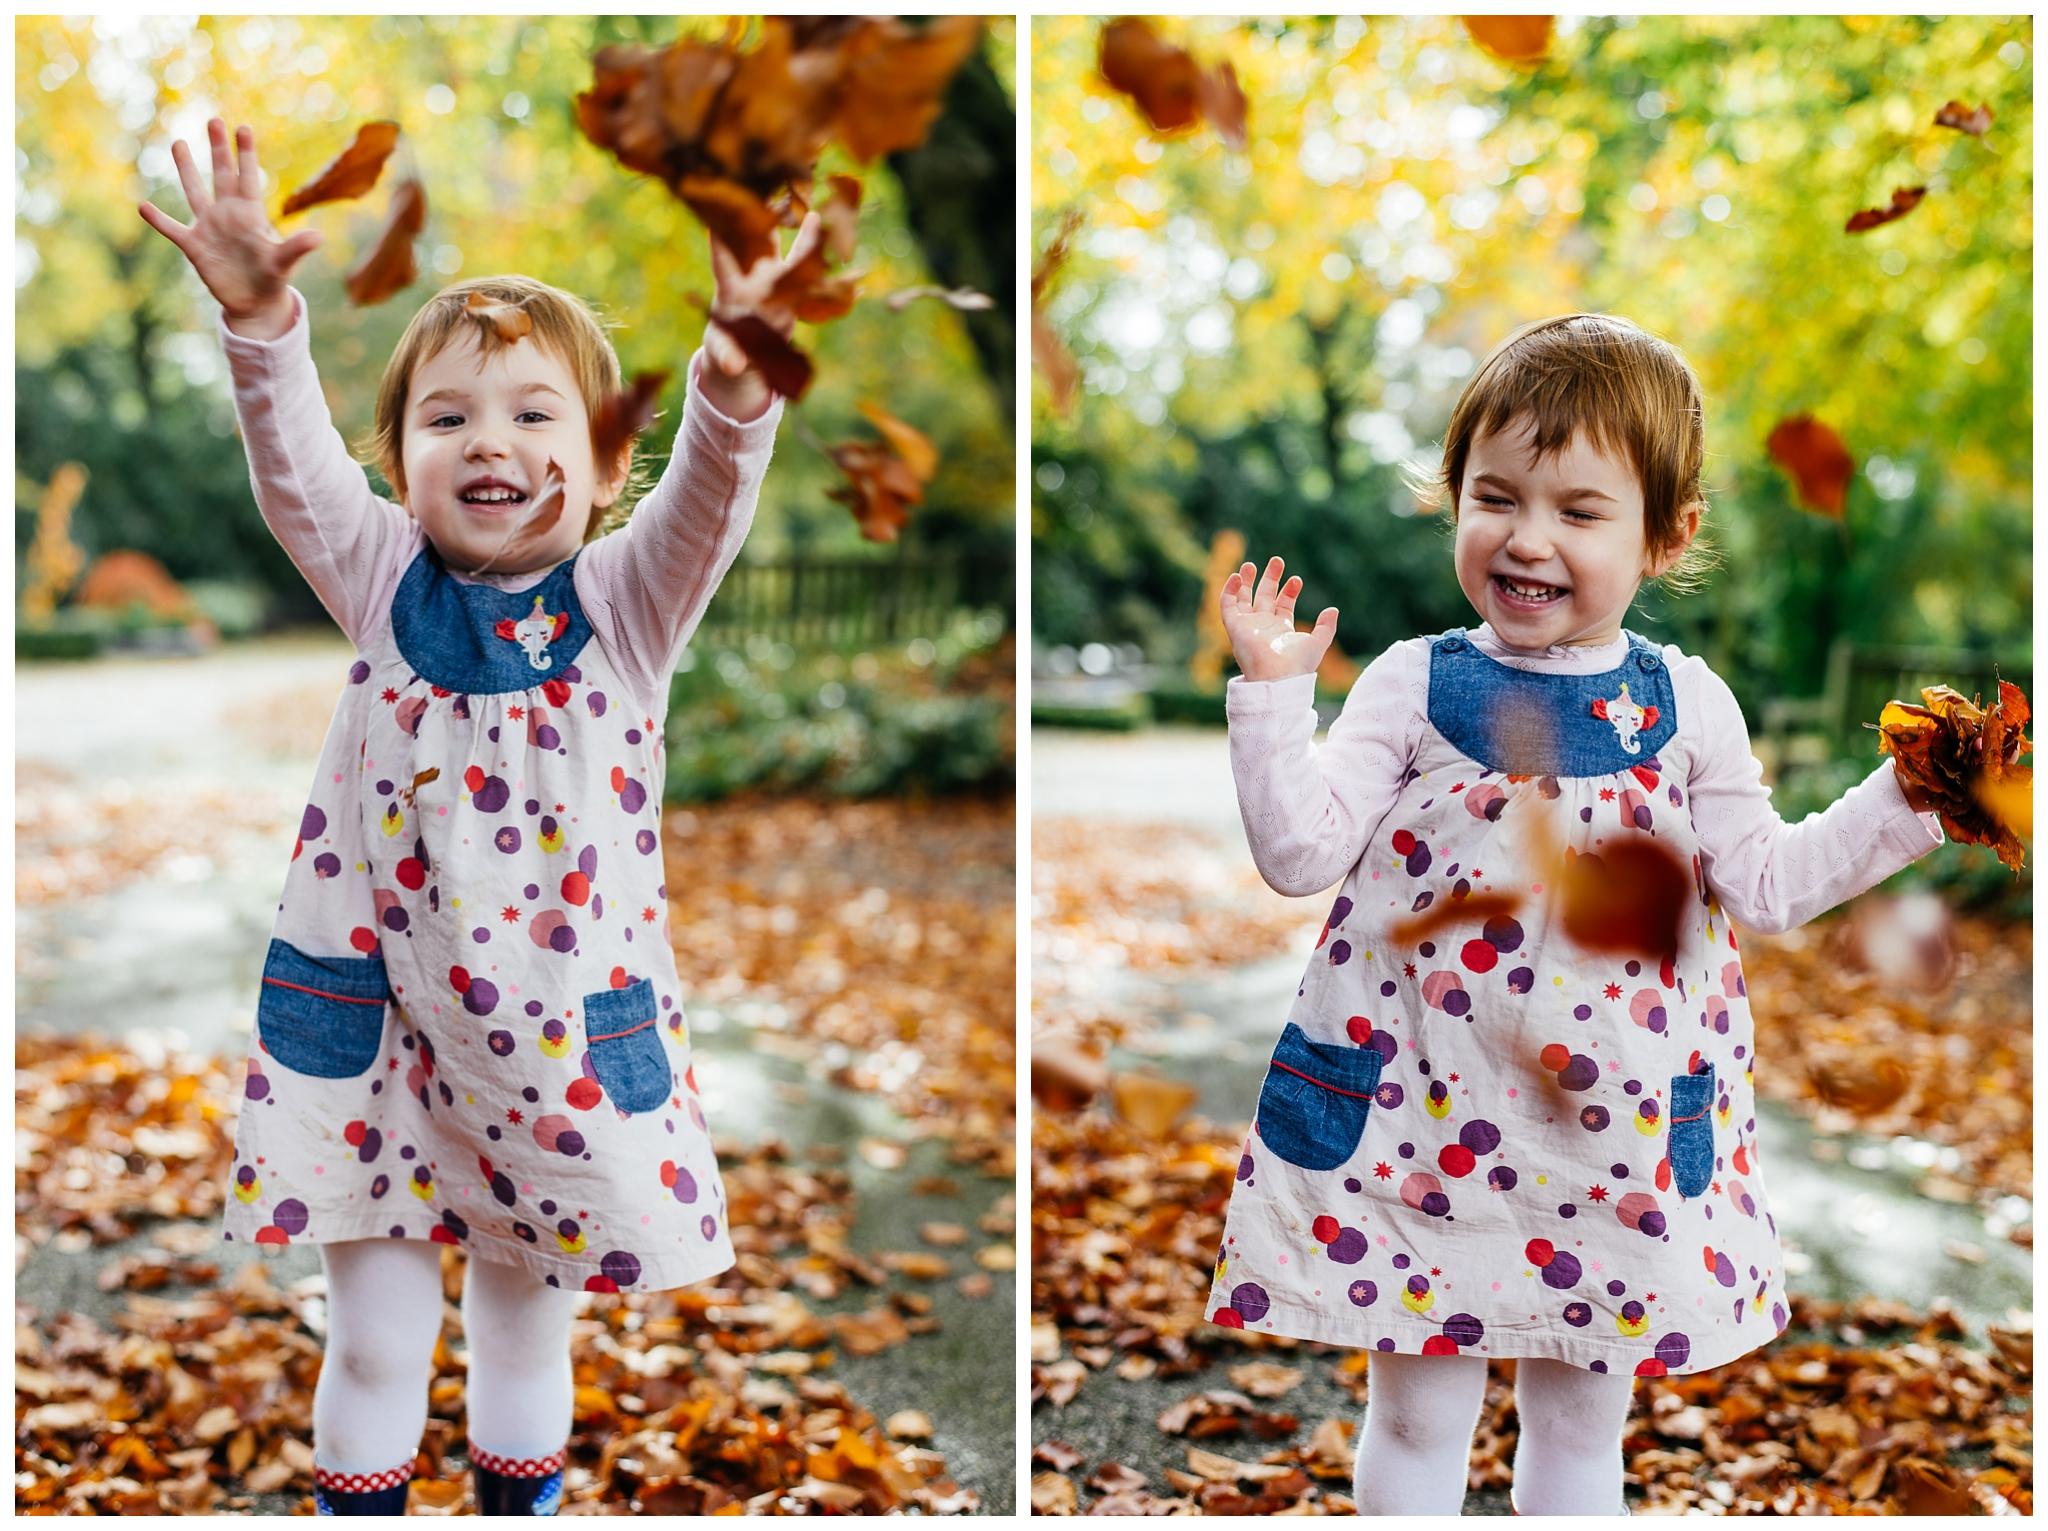 Autumn-family-portraits-birmingham-photographer_0023.jpg